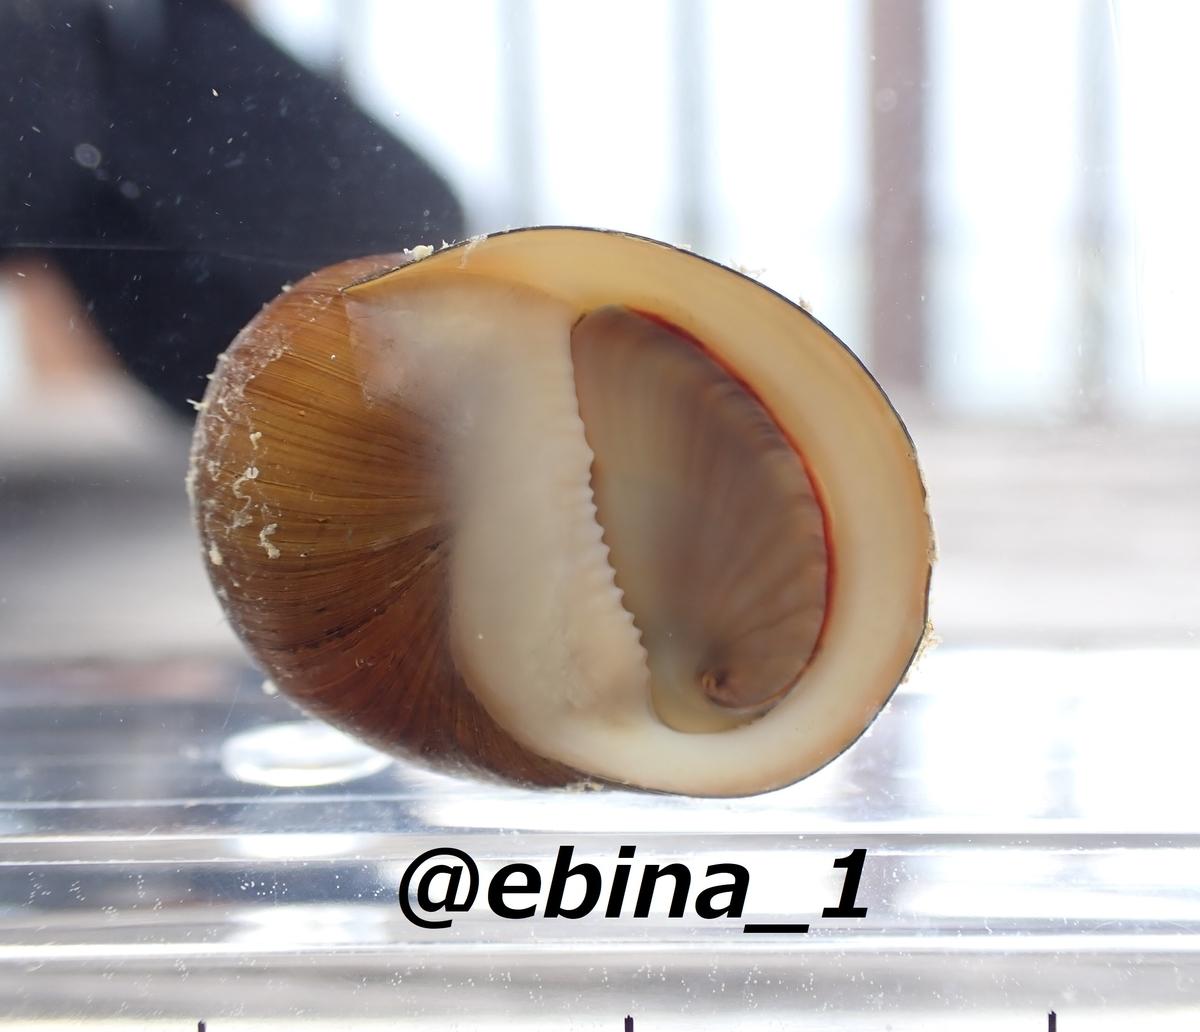 f:id:ebina-1:20210427234549j:plain